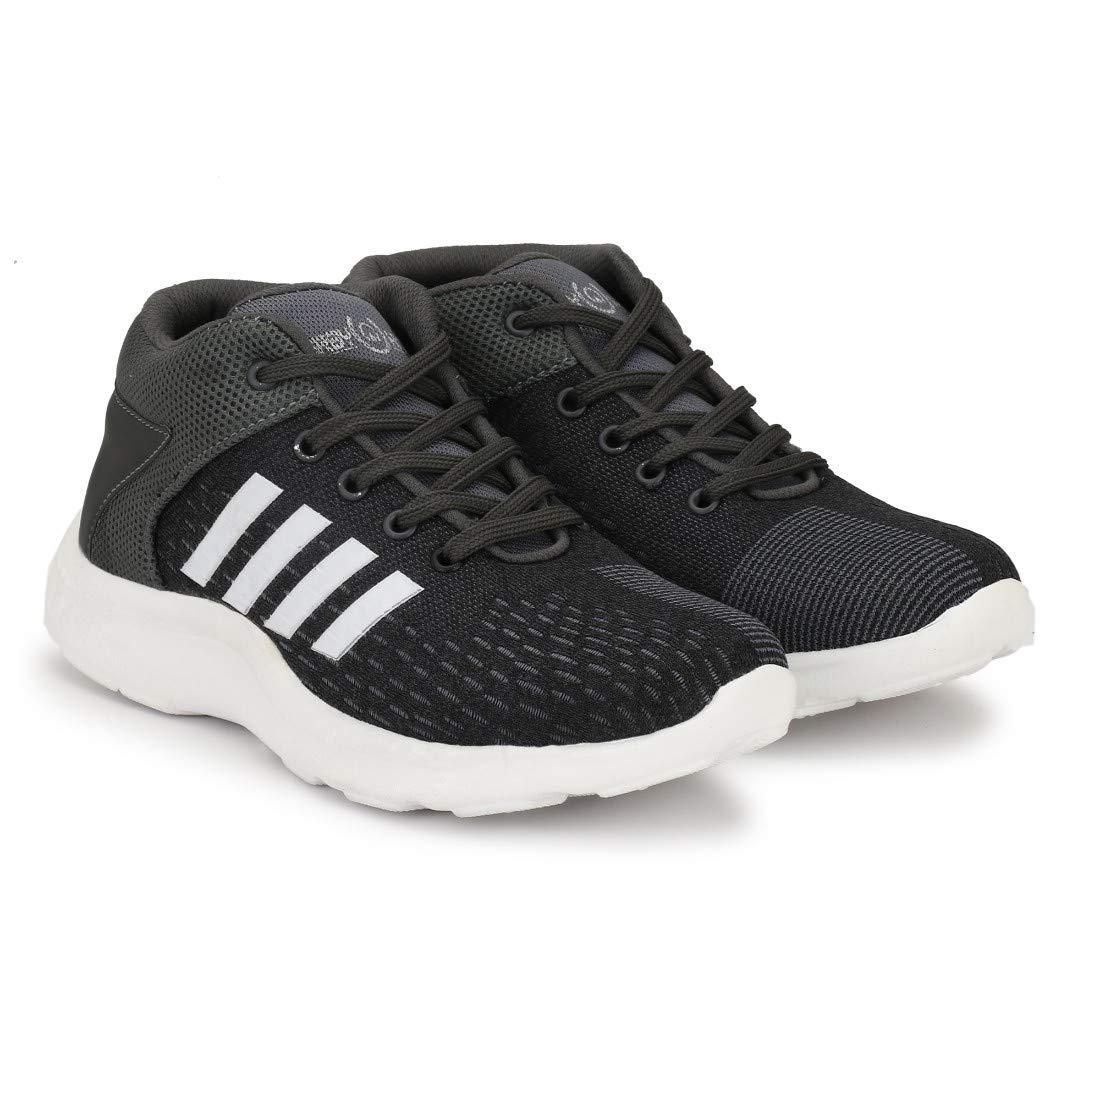 Walking For Shoessport Derby Stylish Shoesrunning Kicks Shoes Men mN08nvwO